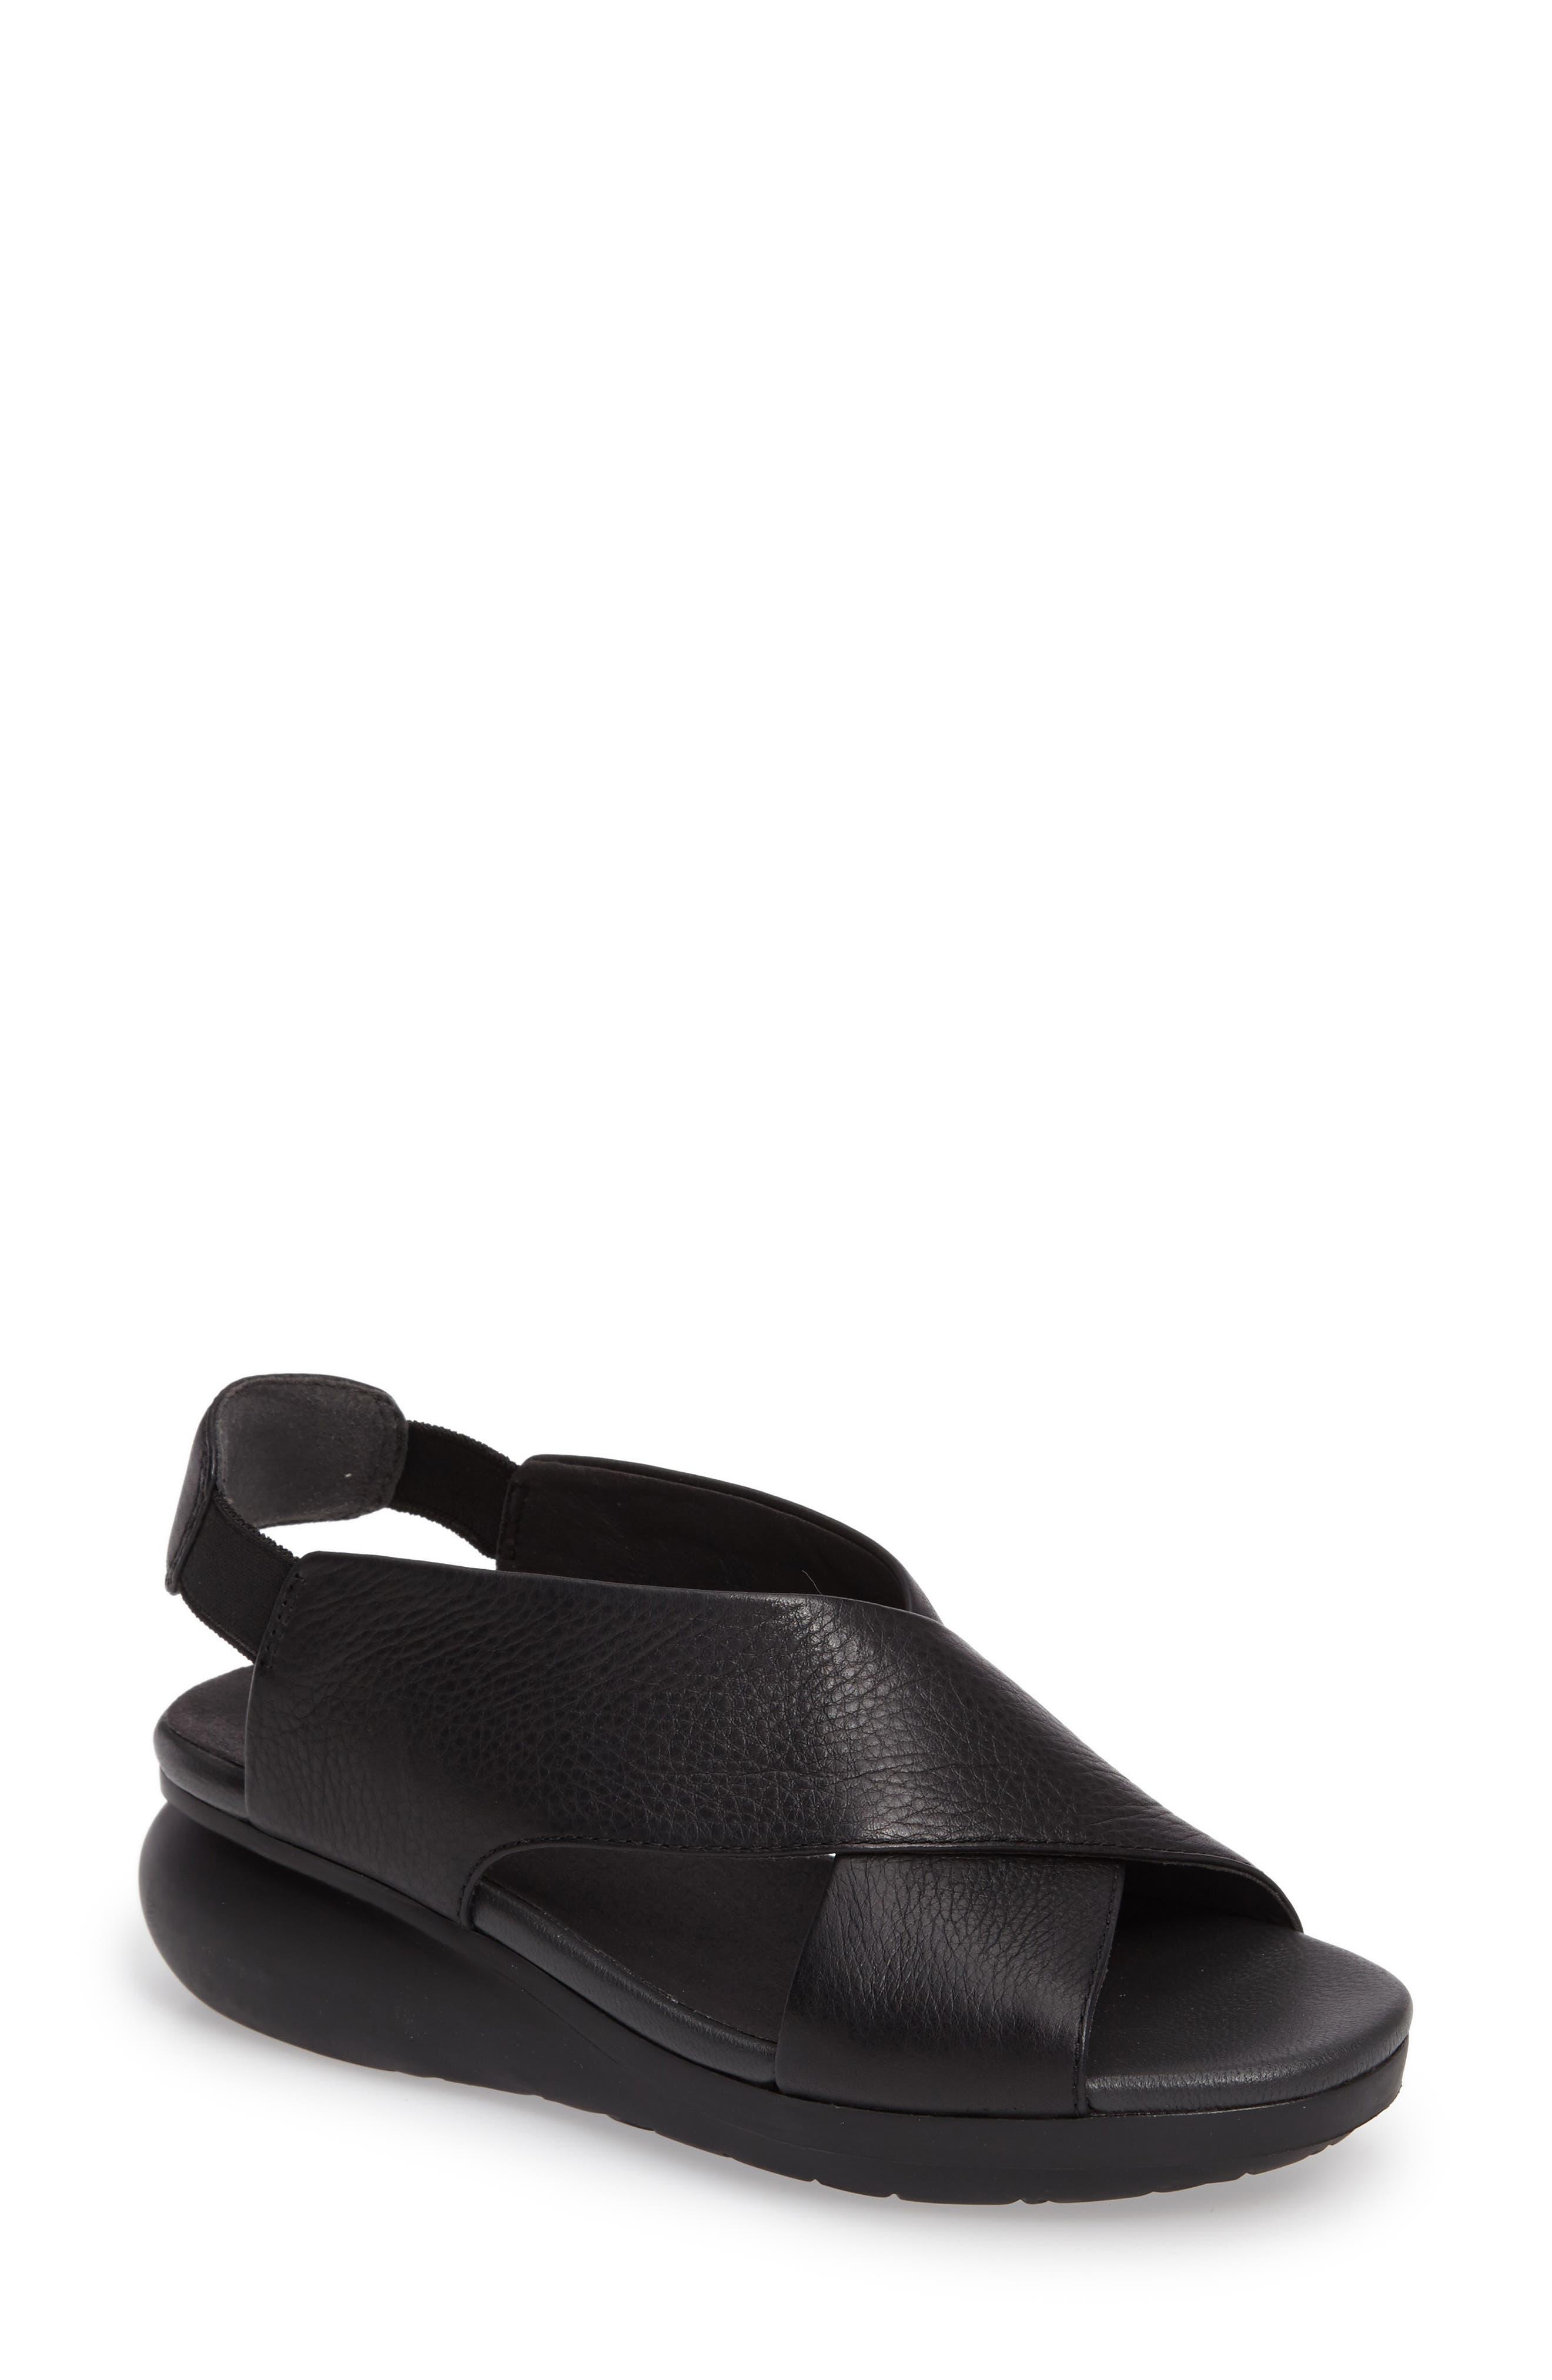 Balloon Slingback Wedge Sandal,                             Main thumbnail 1, color,                             Black Leather